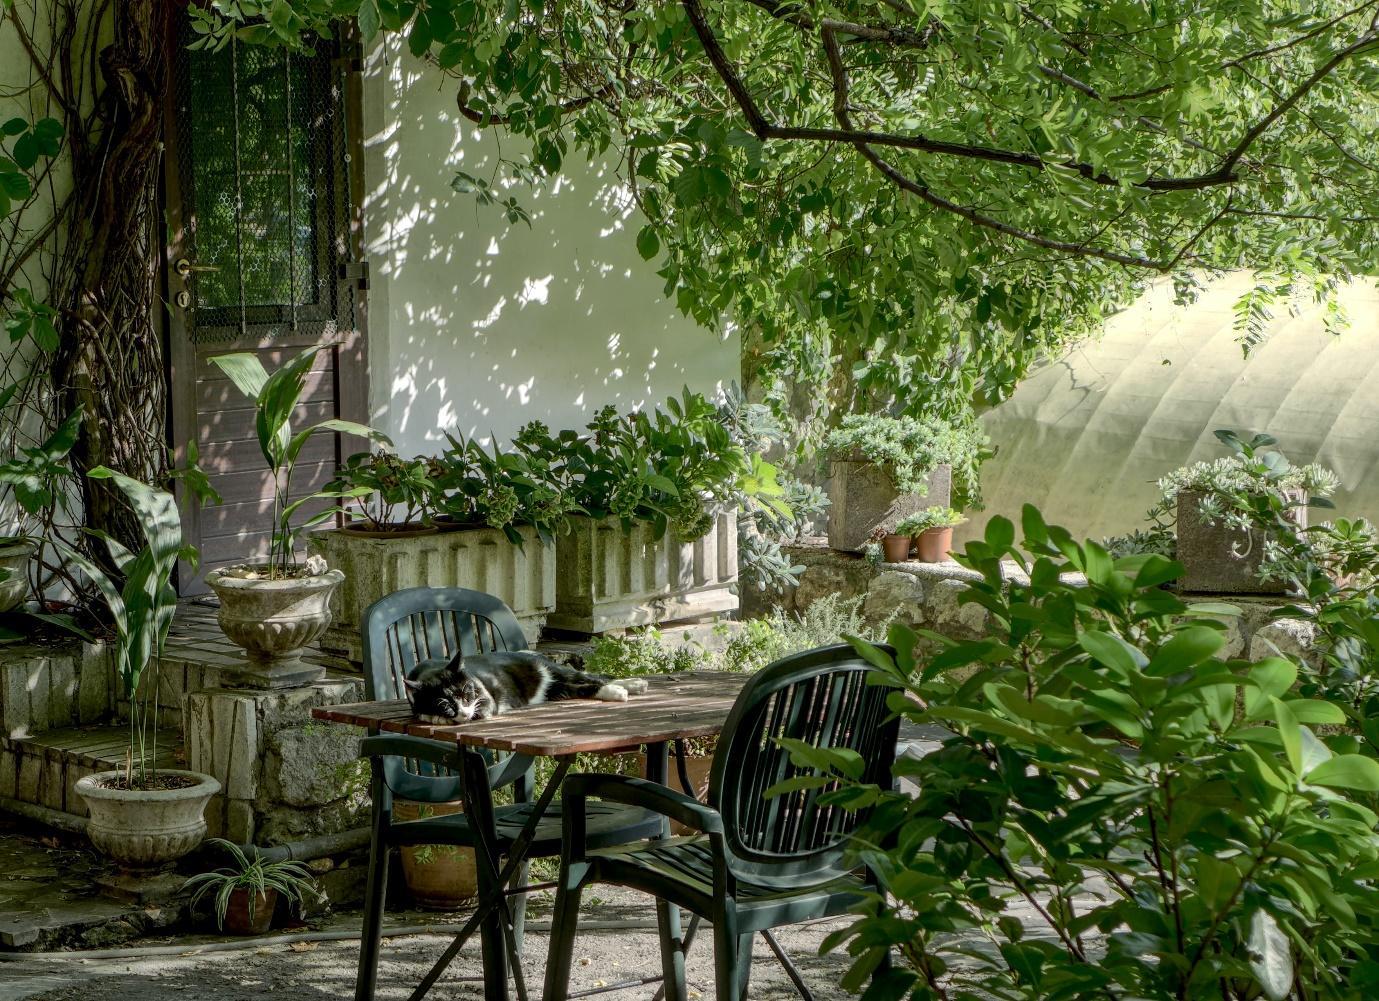 Outdoor Garden Furniture – Keep Them Looking New